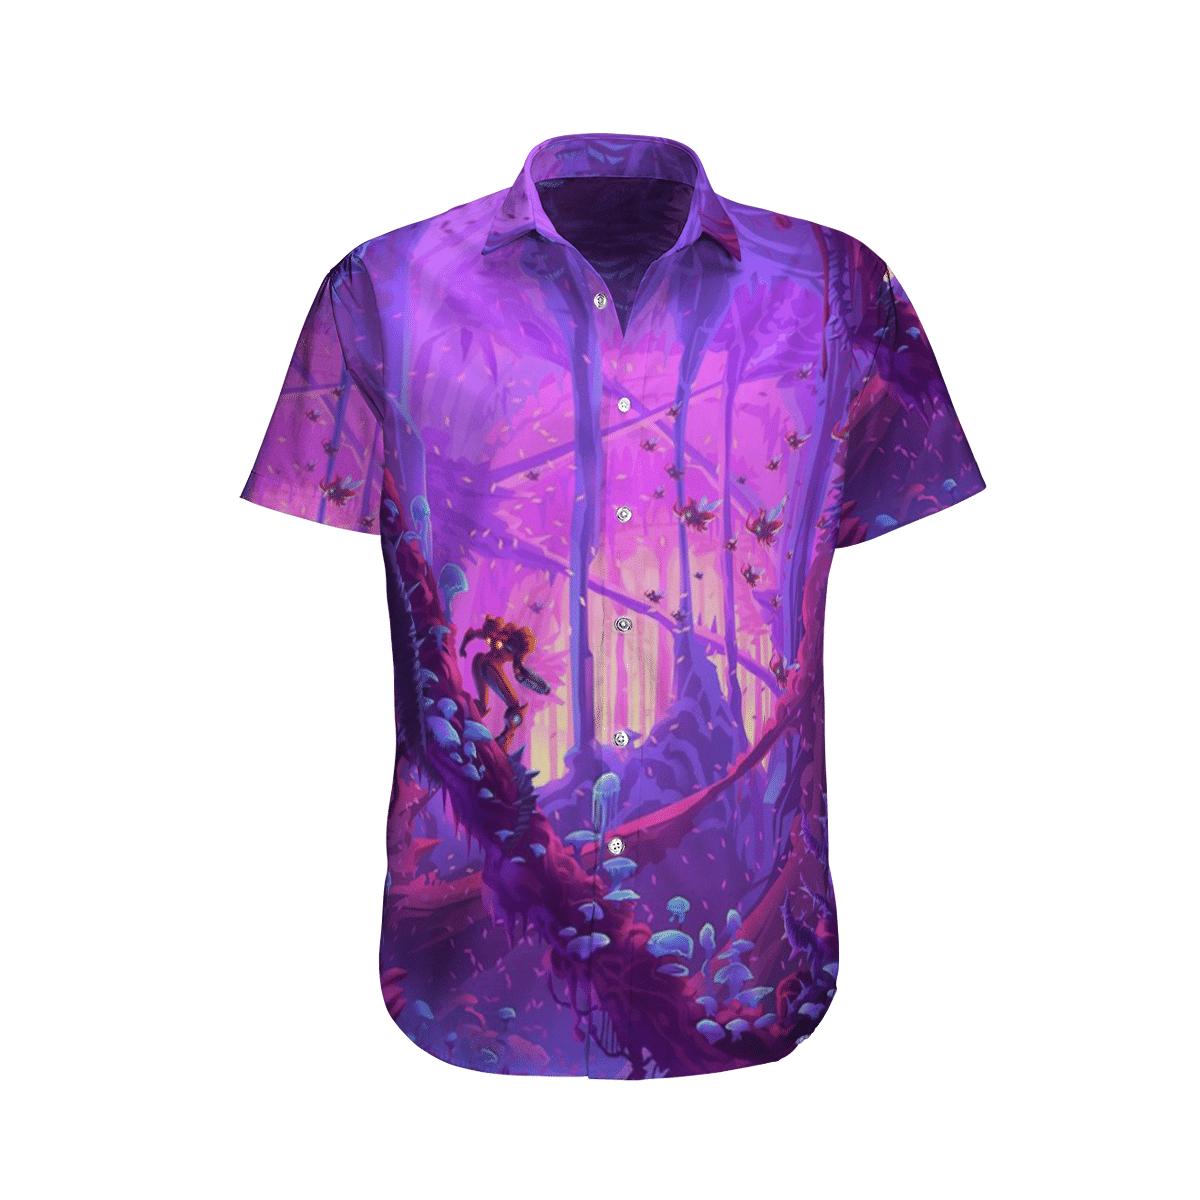 Metroid Prime Purple Forest Hawaiian Shirt